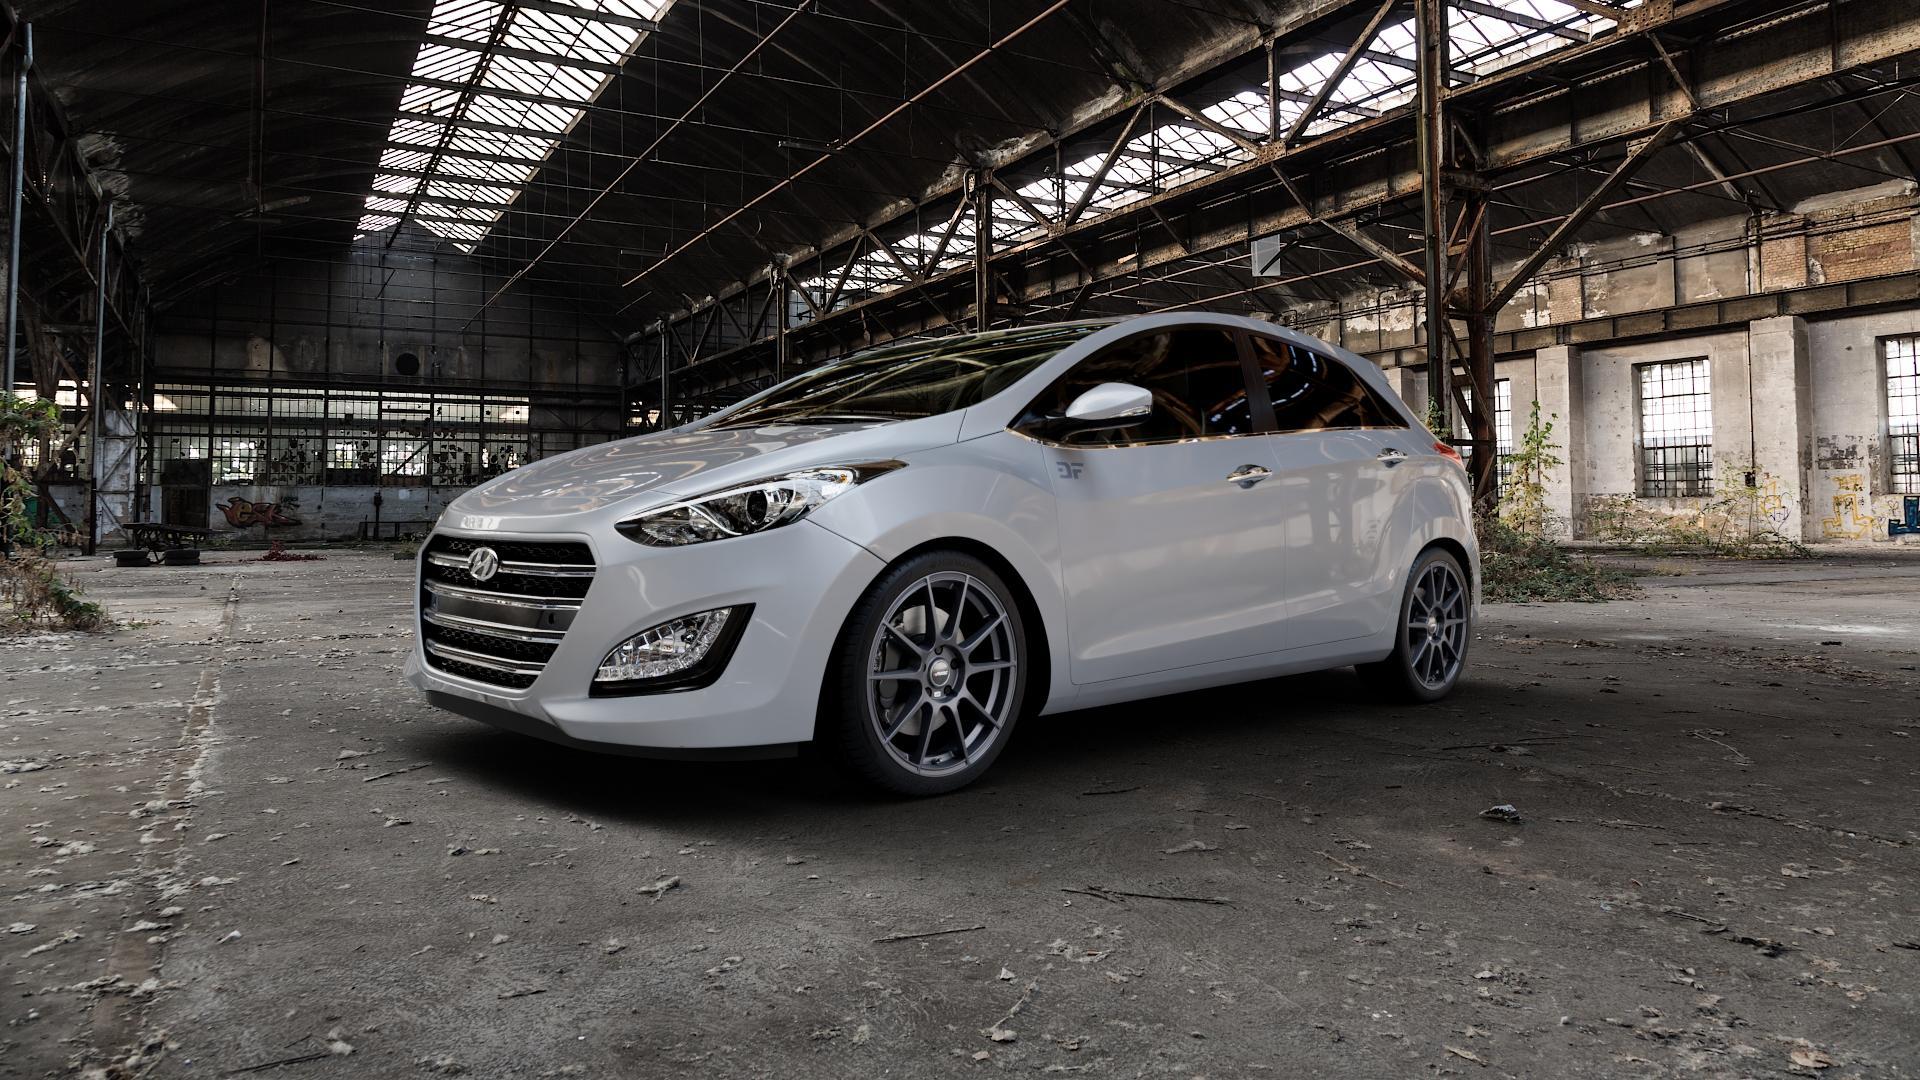 Car Rims Original Hyundai I30 Felgen Satz 52910-2L150 15 Zoll NEU ...